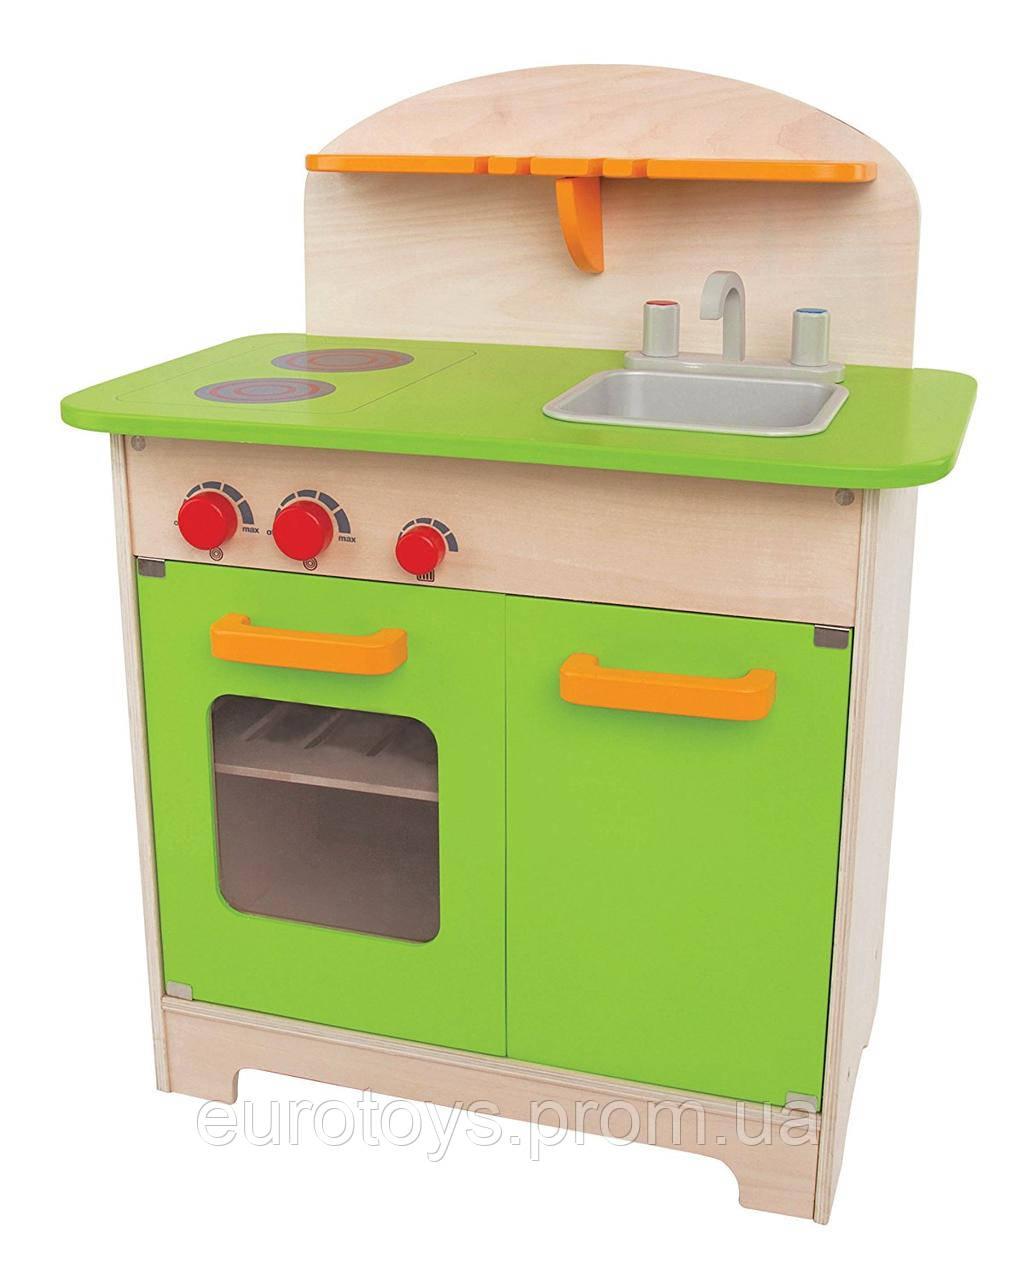 HAPE Кухня для гурманов, зеленая (E3101)